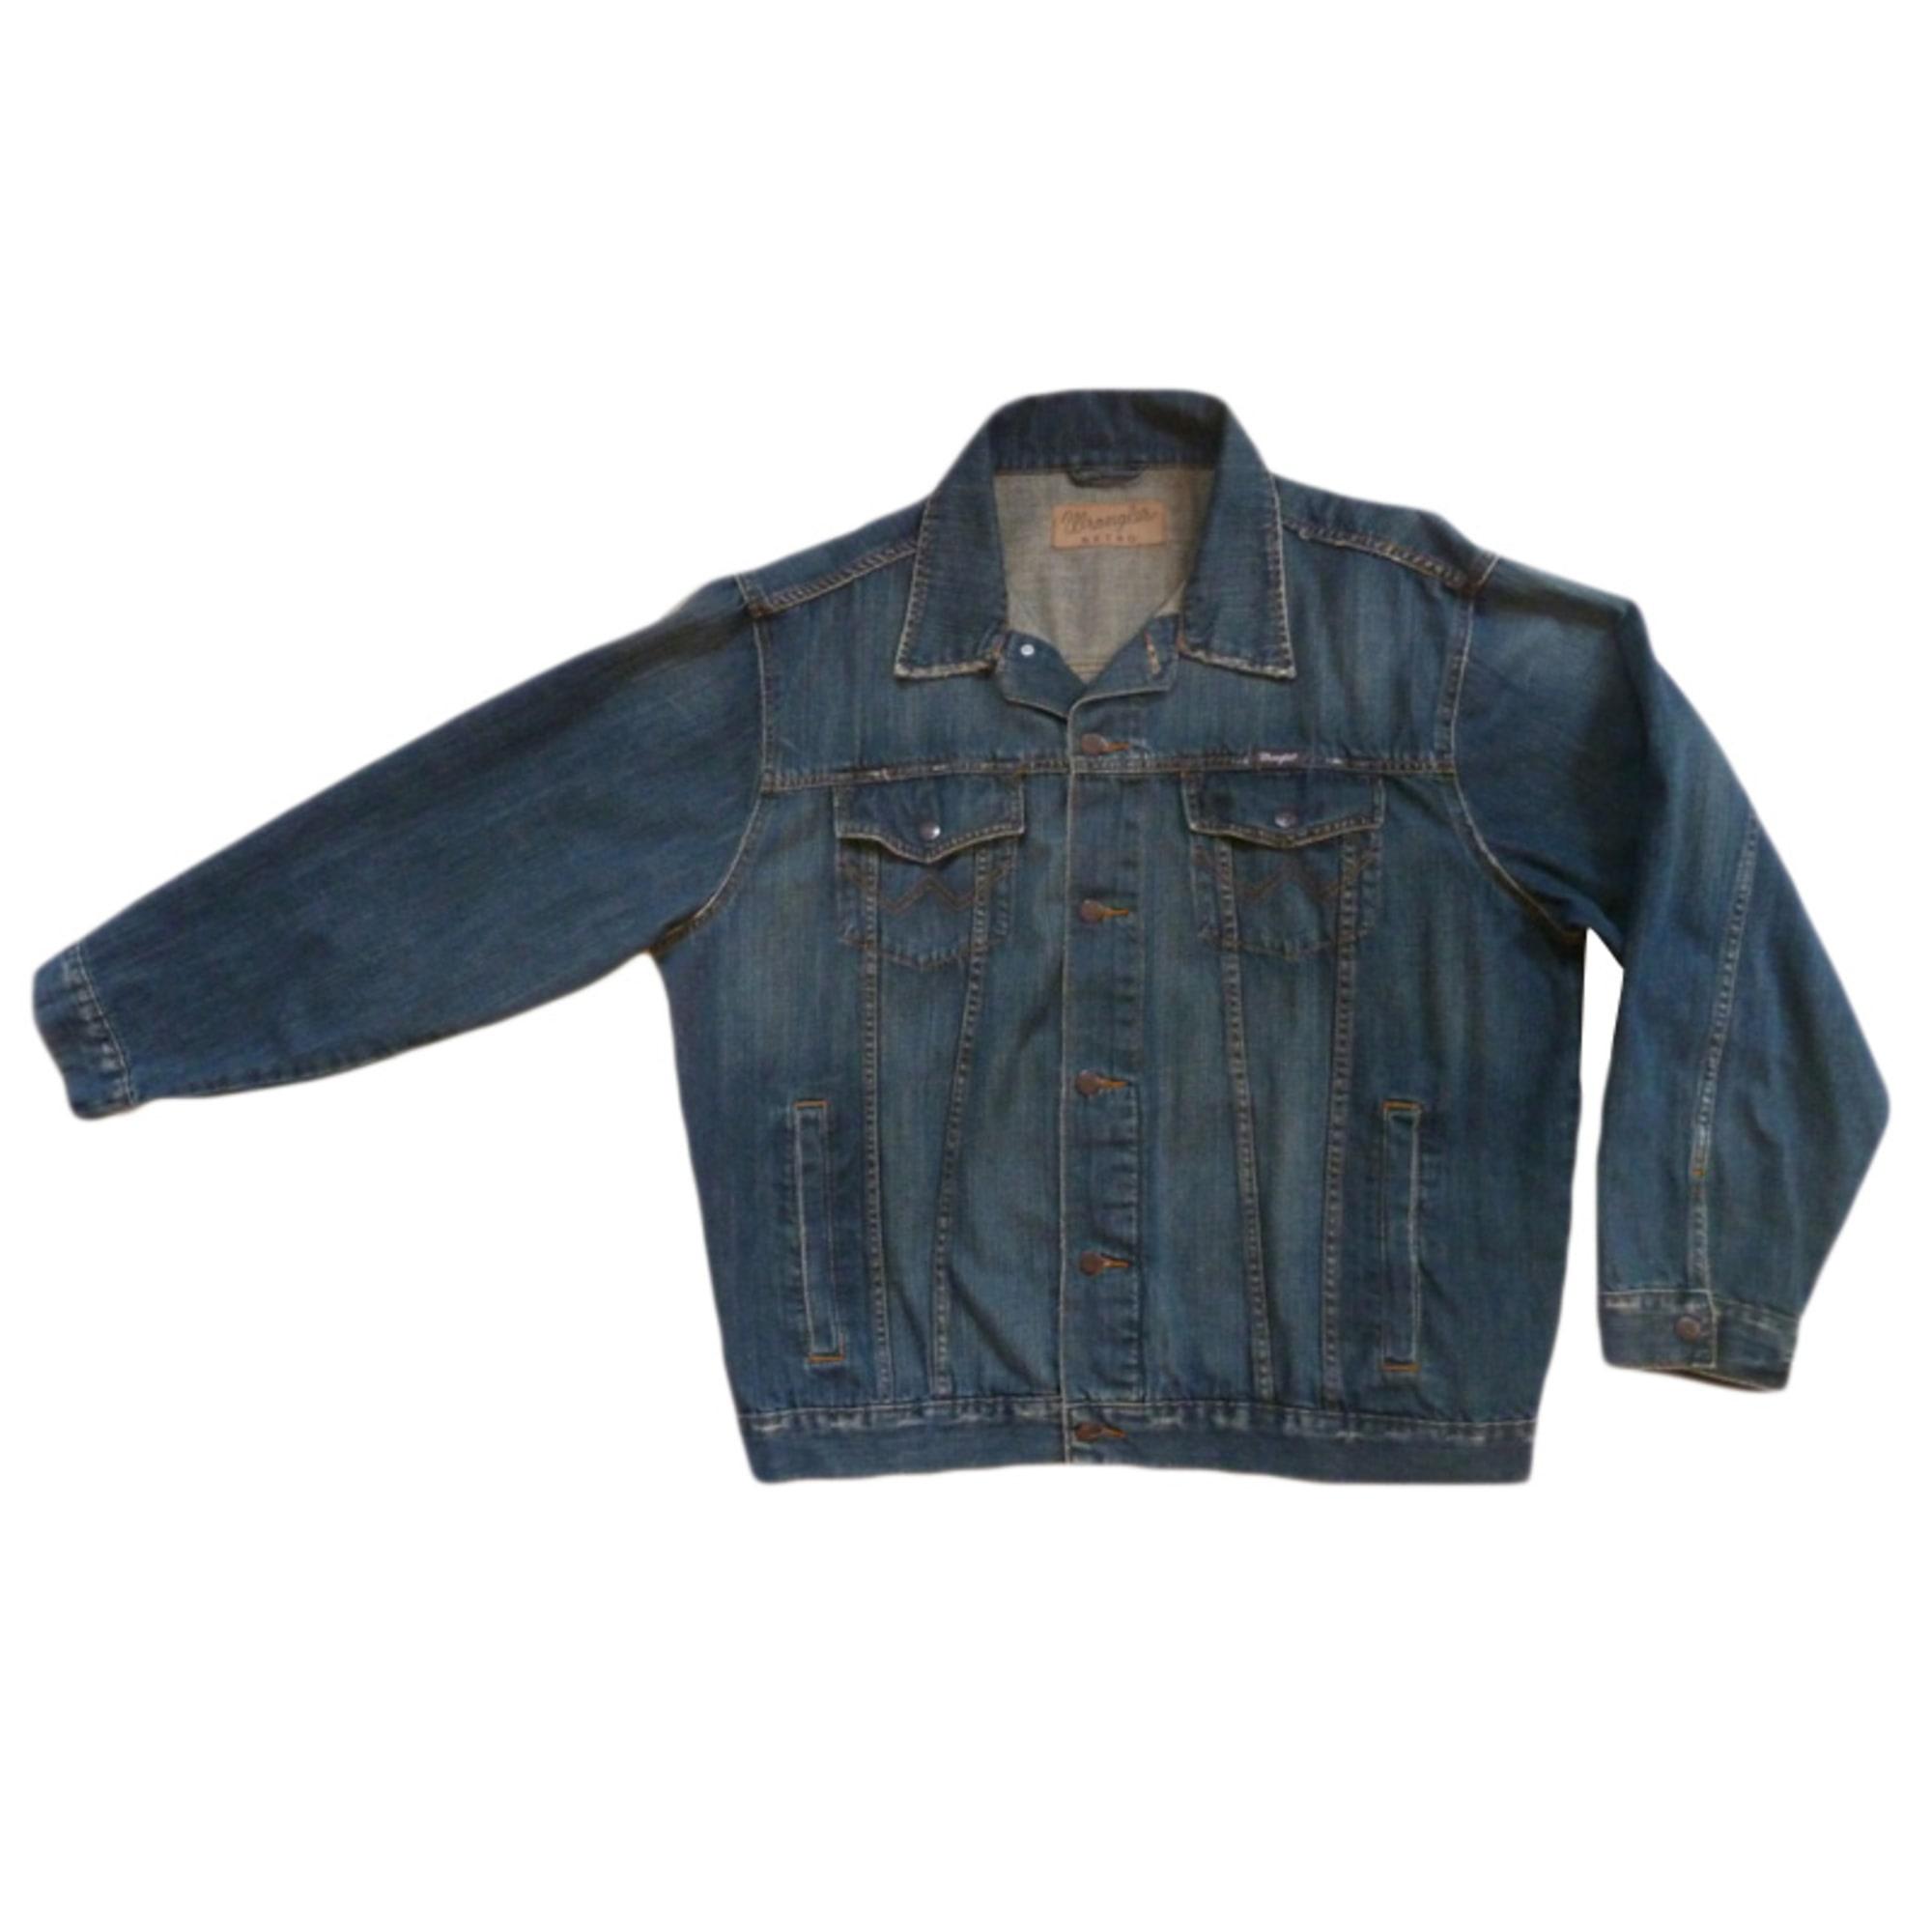 En Vendu Bleu xl 1814366 Par Jean Wrangler Veste Shopname67802 58 SdwF1Fq 2bf6e58989d